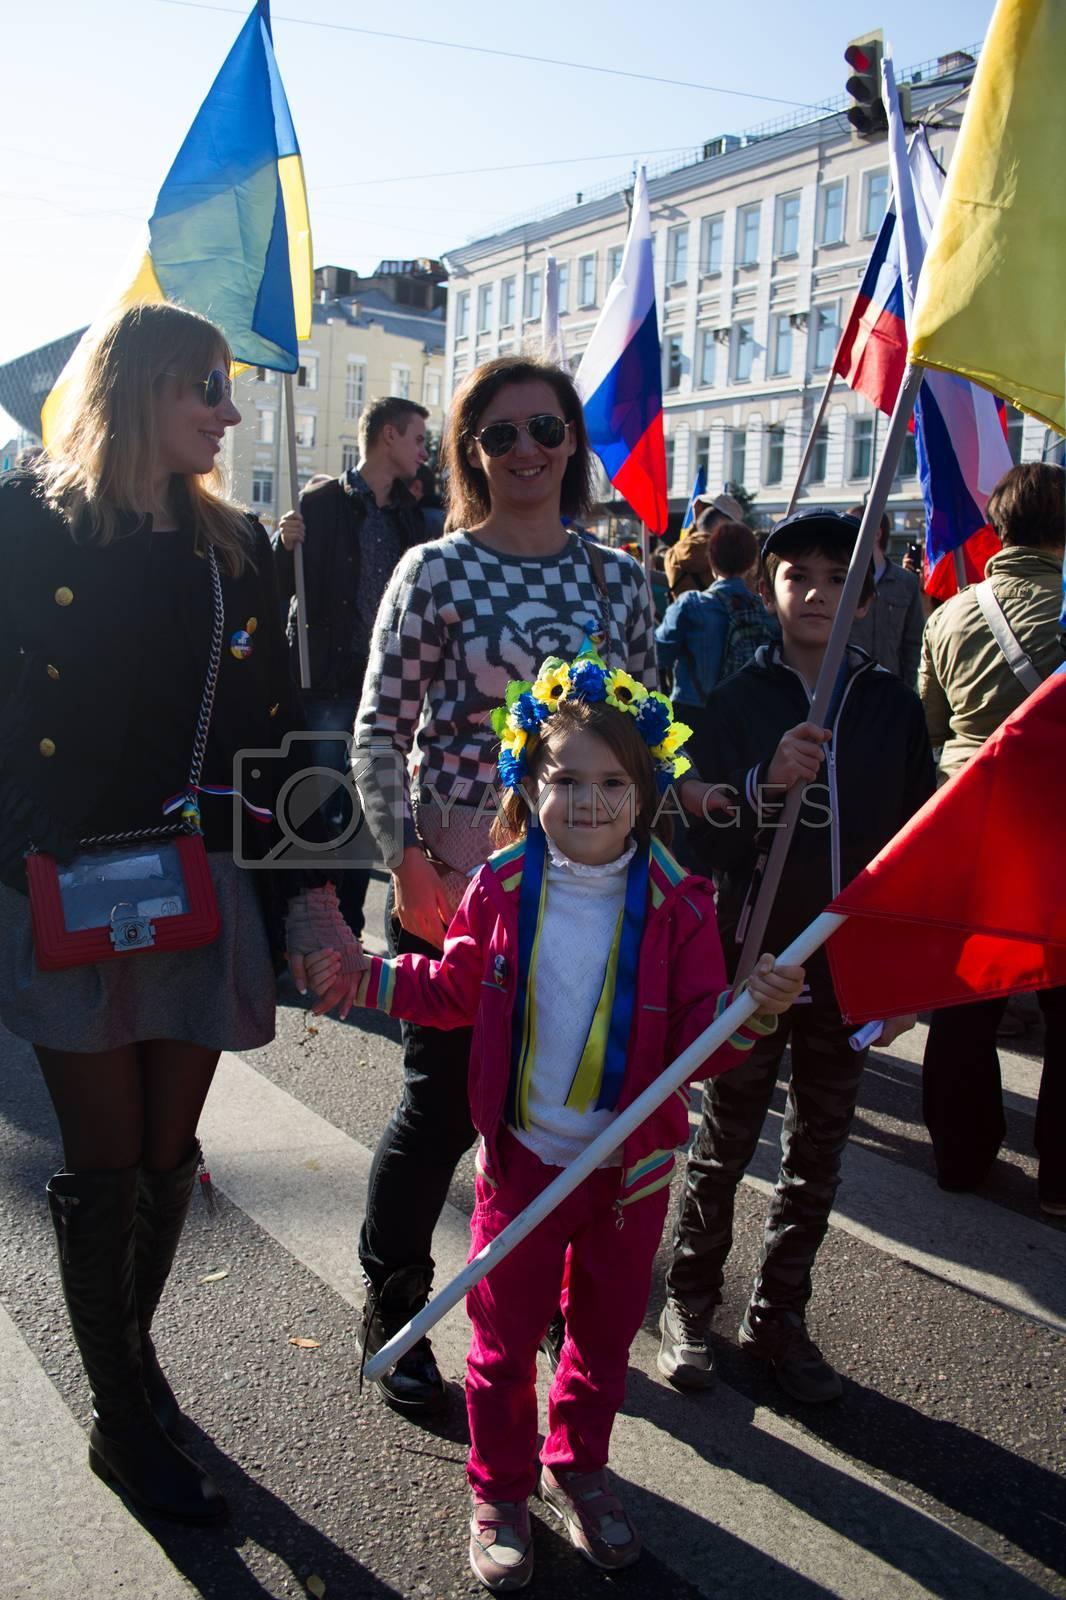 Royalty free image of little girl in the Ukrainian wreath by olegkozyrev